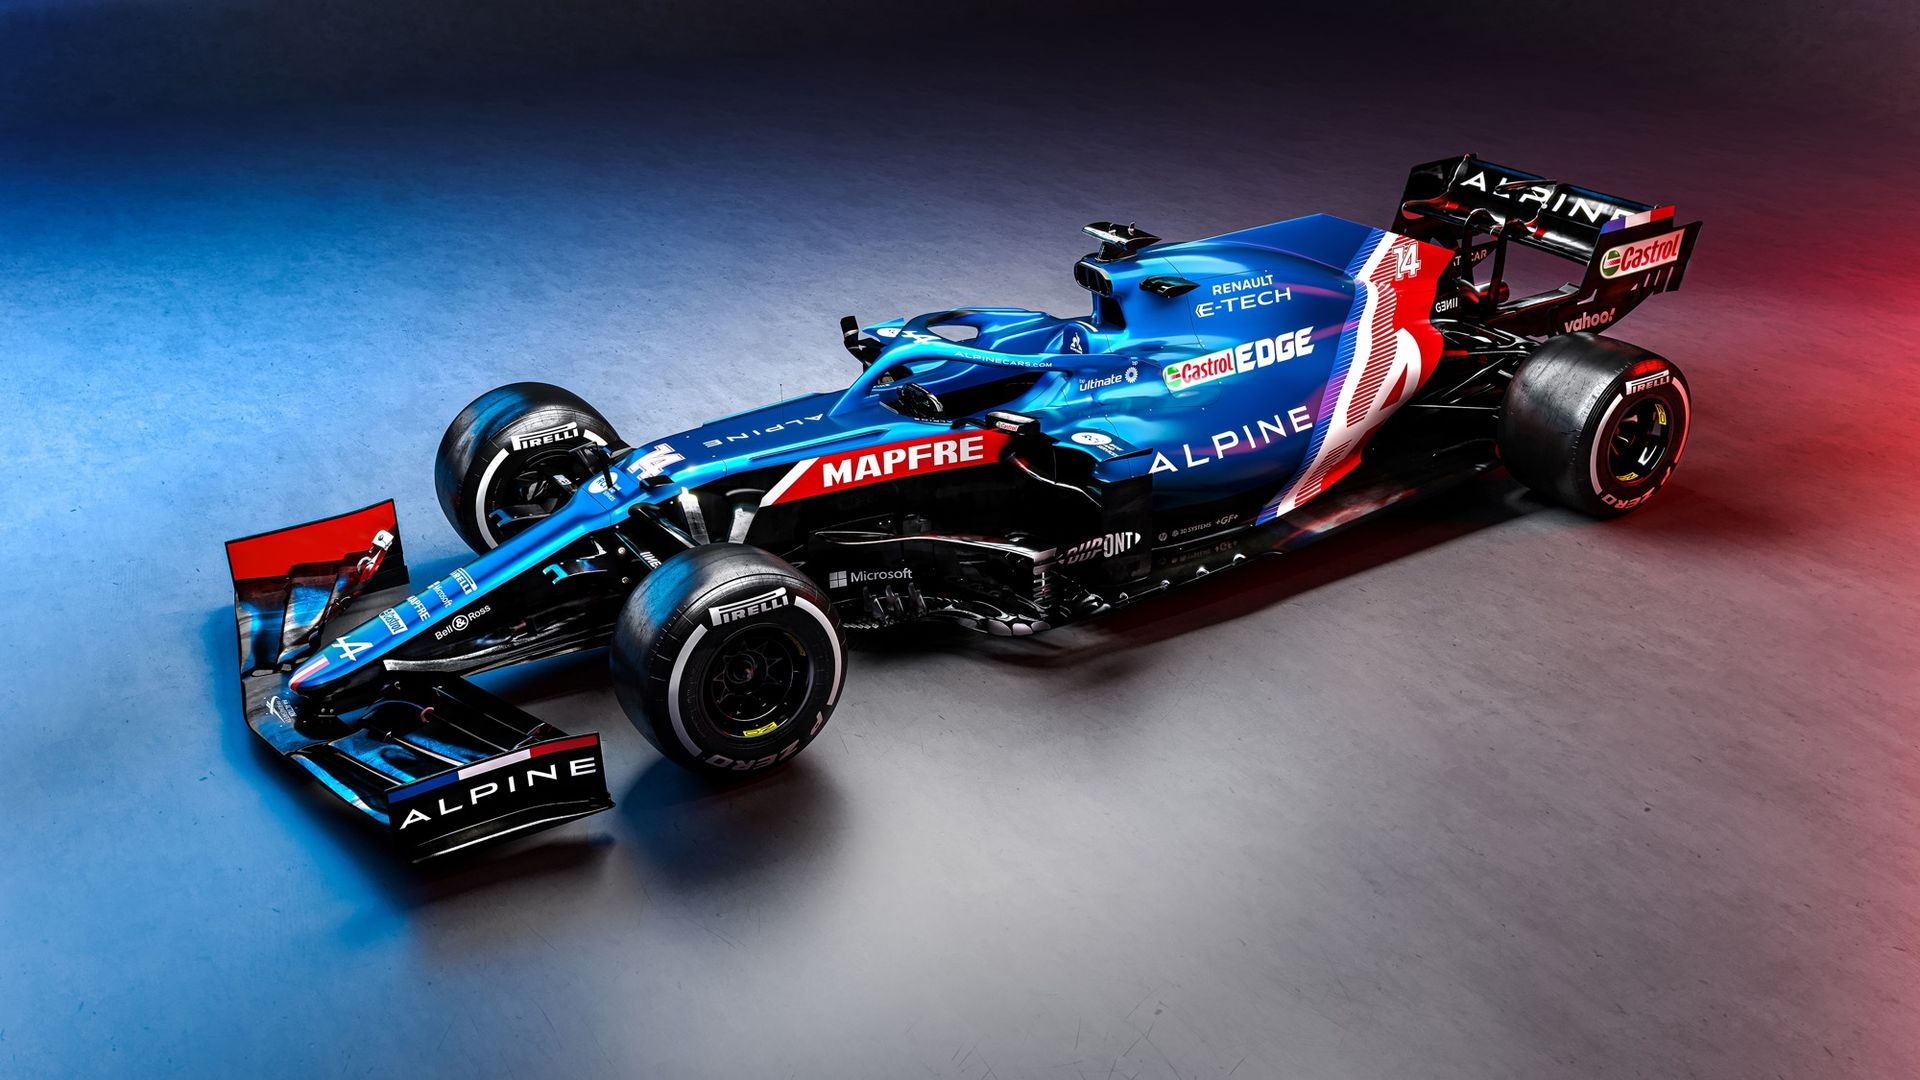 Alpine F1 visar nya bilen